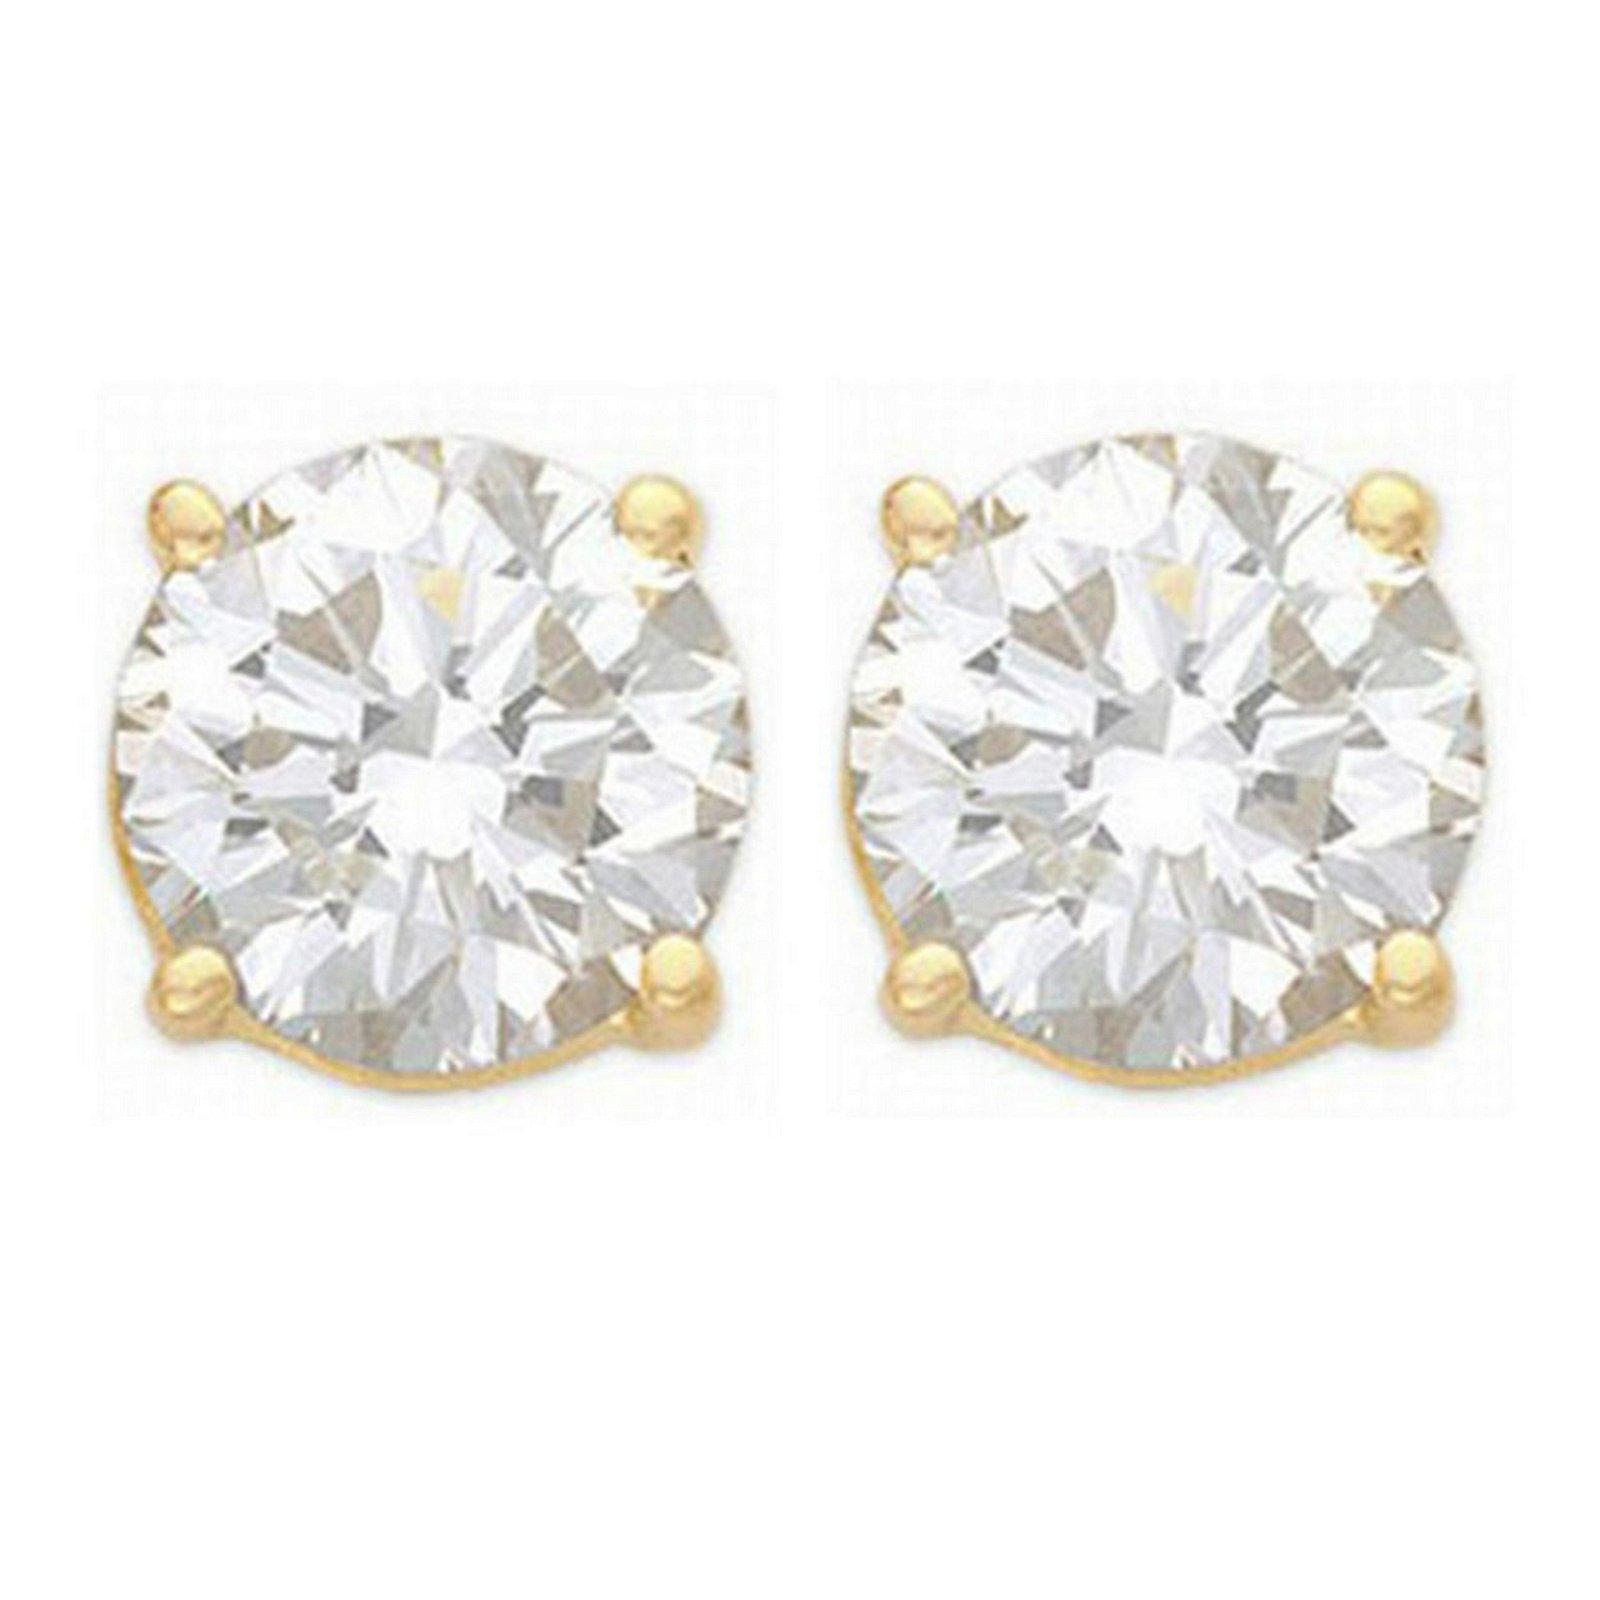 2.0 ctw VS/SI Diamond Stud Earrings 14K Yellow Gold -